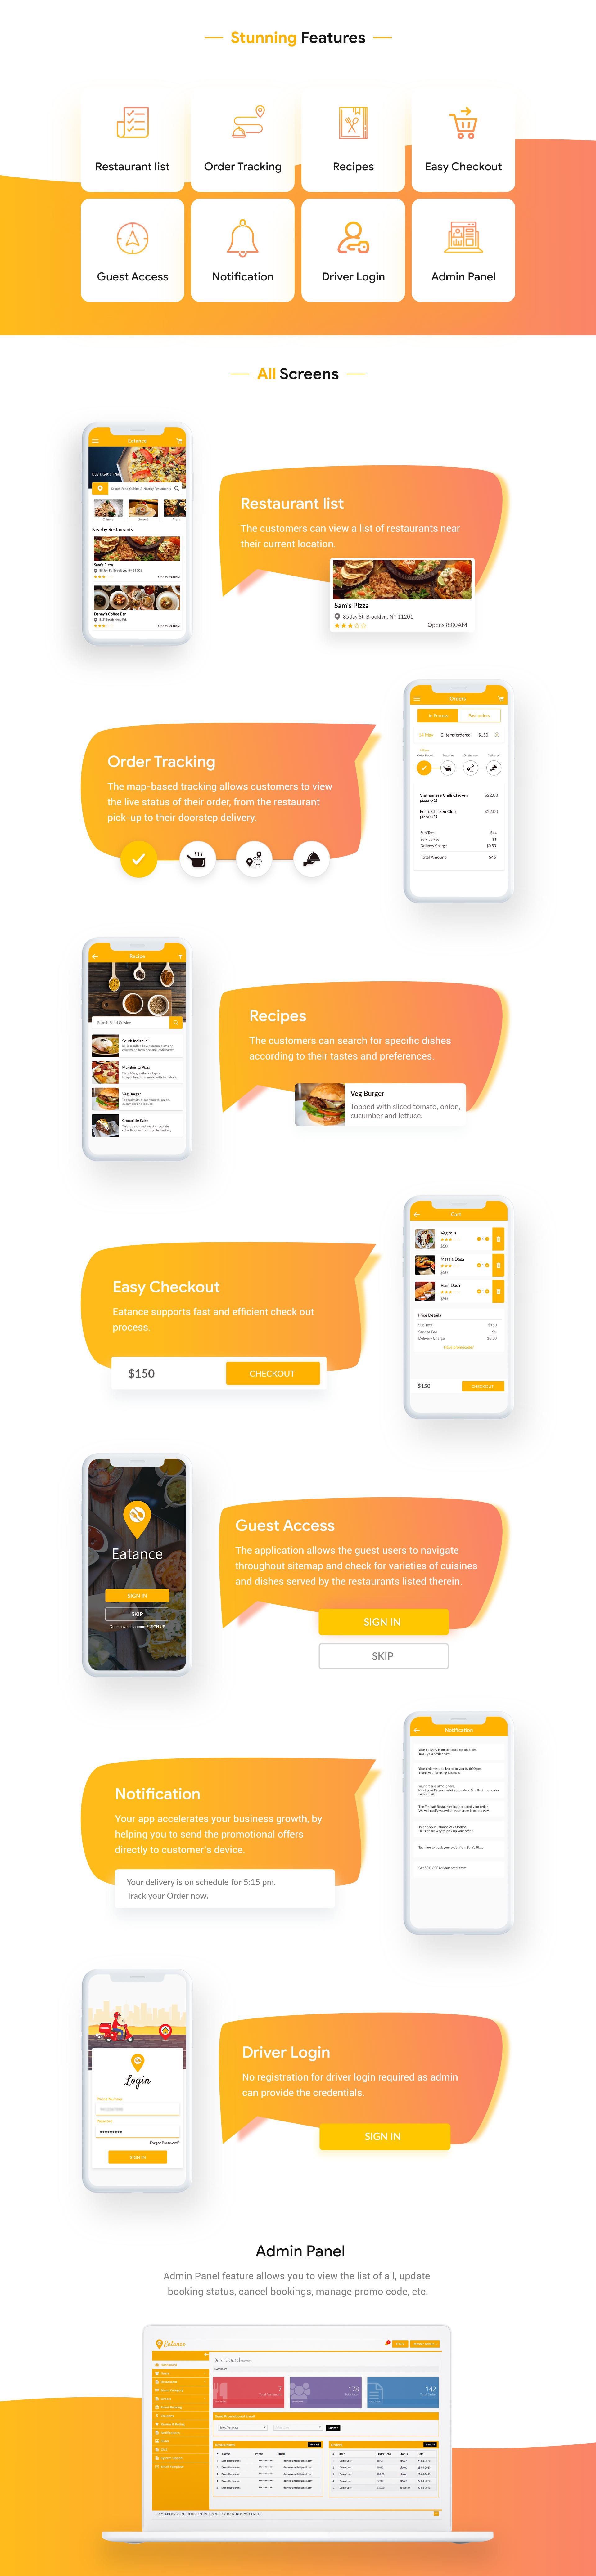 Multi Restaurant App